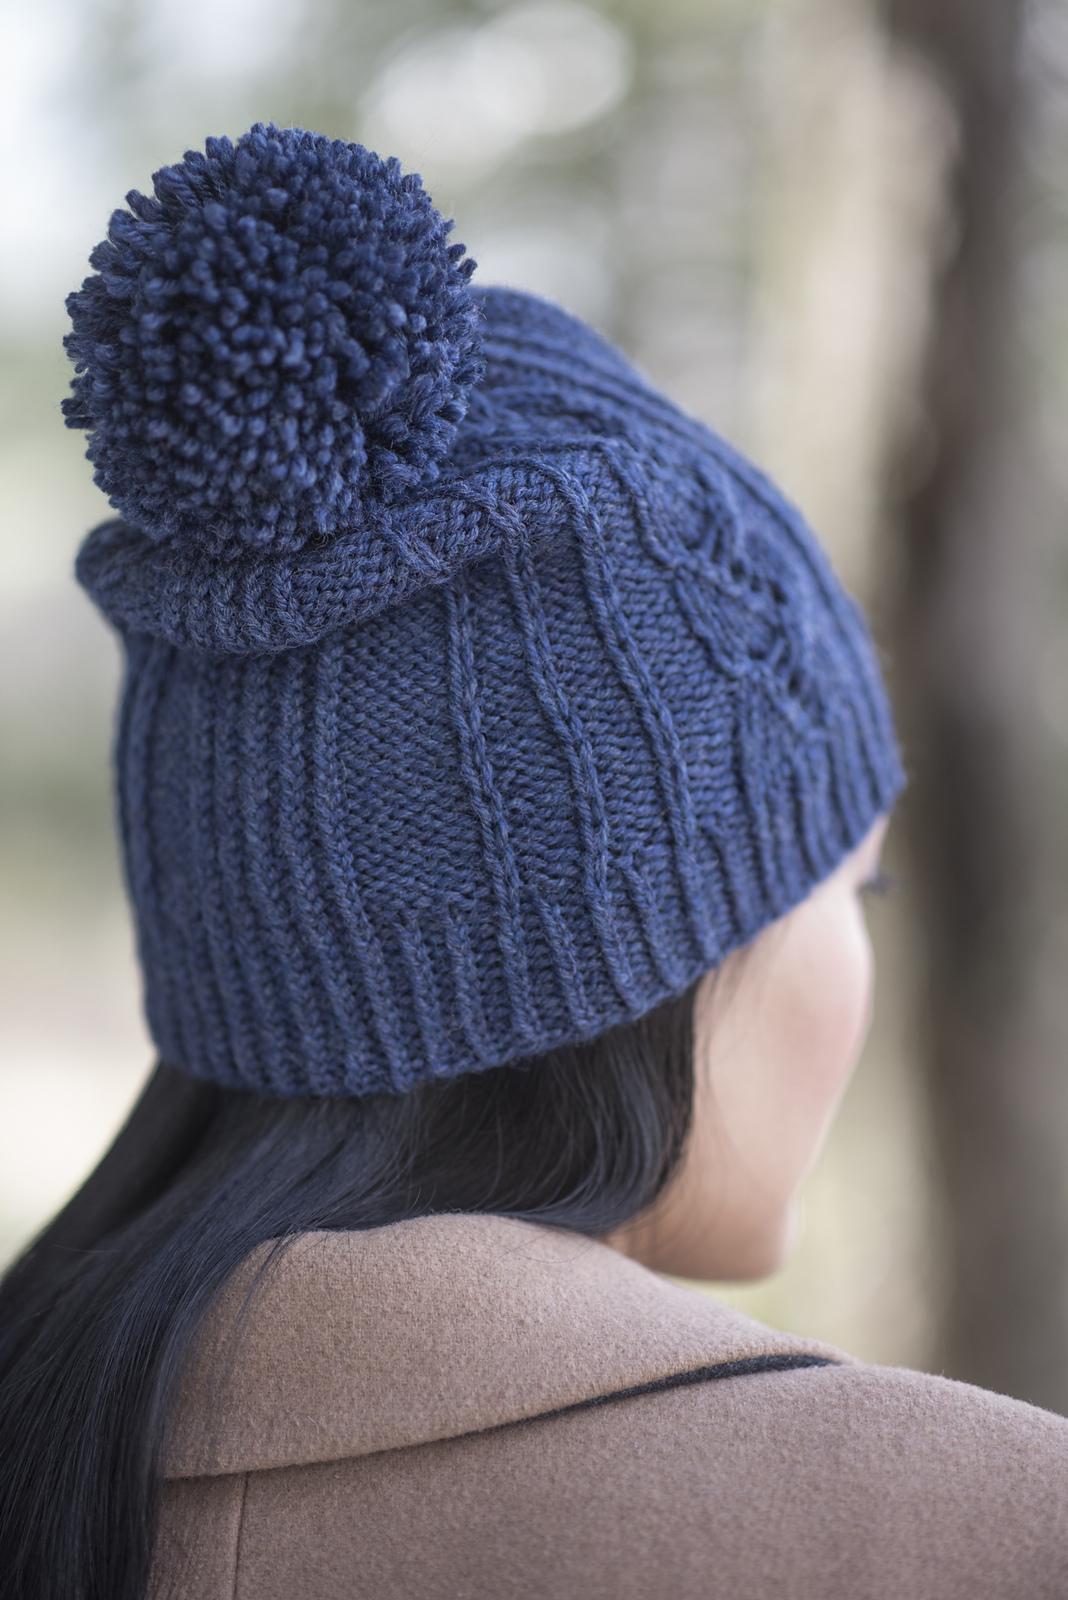 Cavilleri Hat by Shannon Cook #cavillerihat